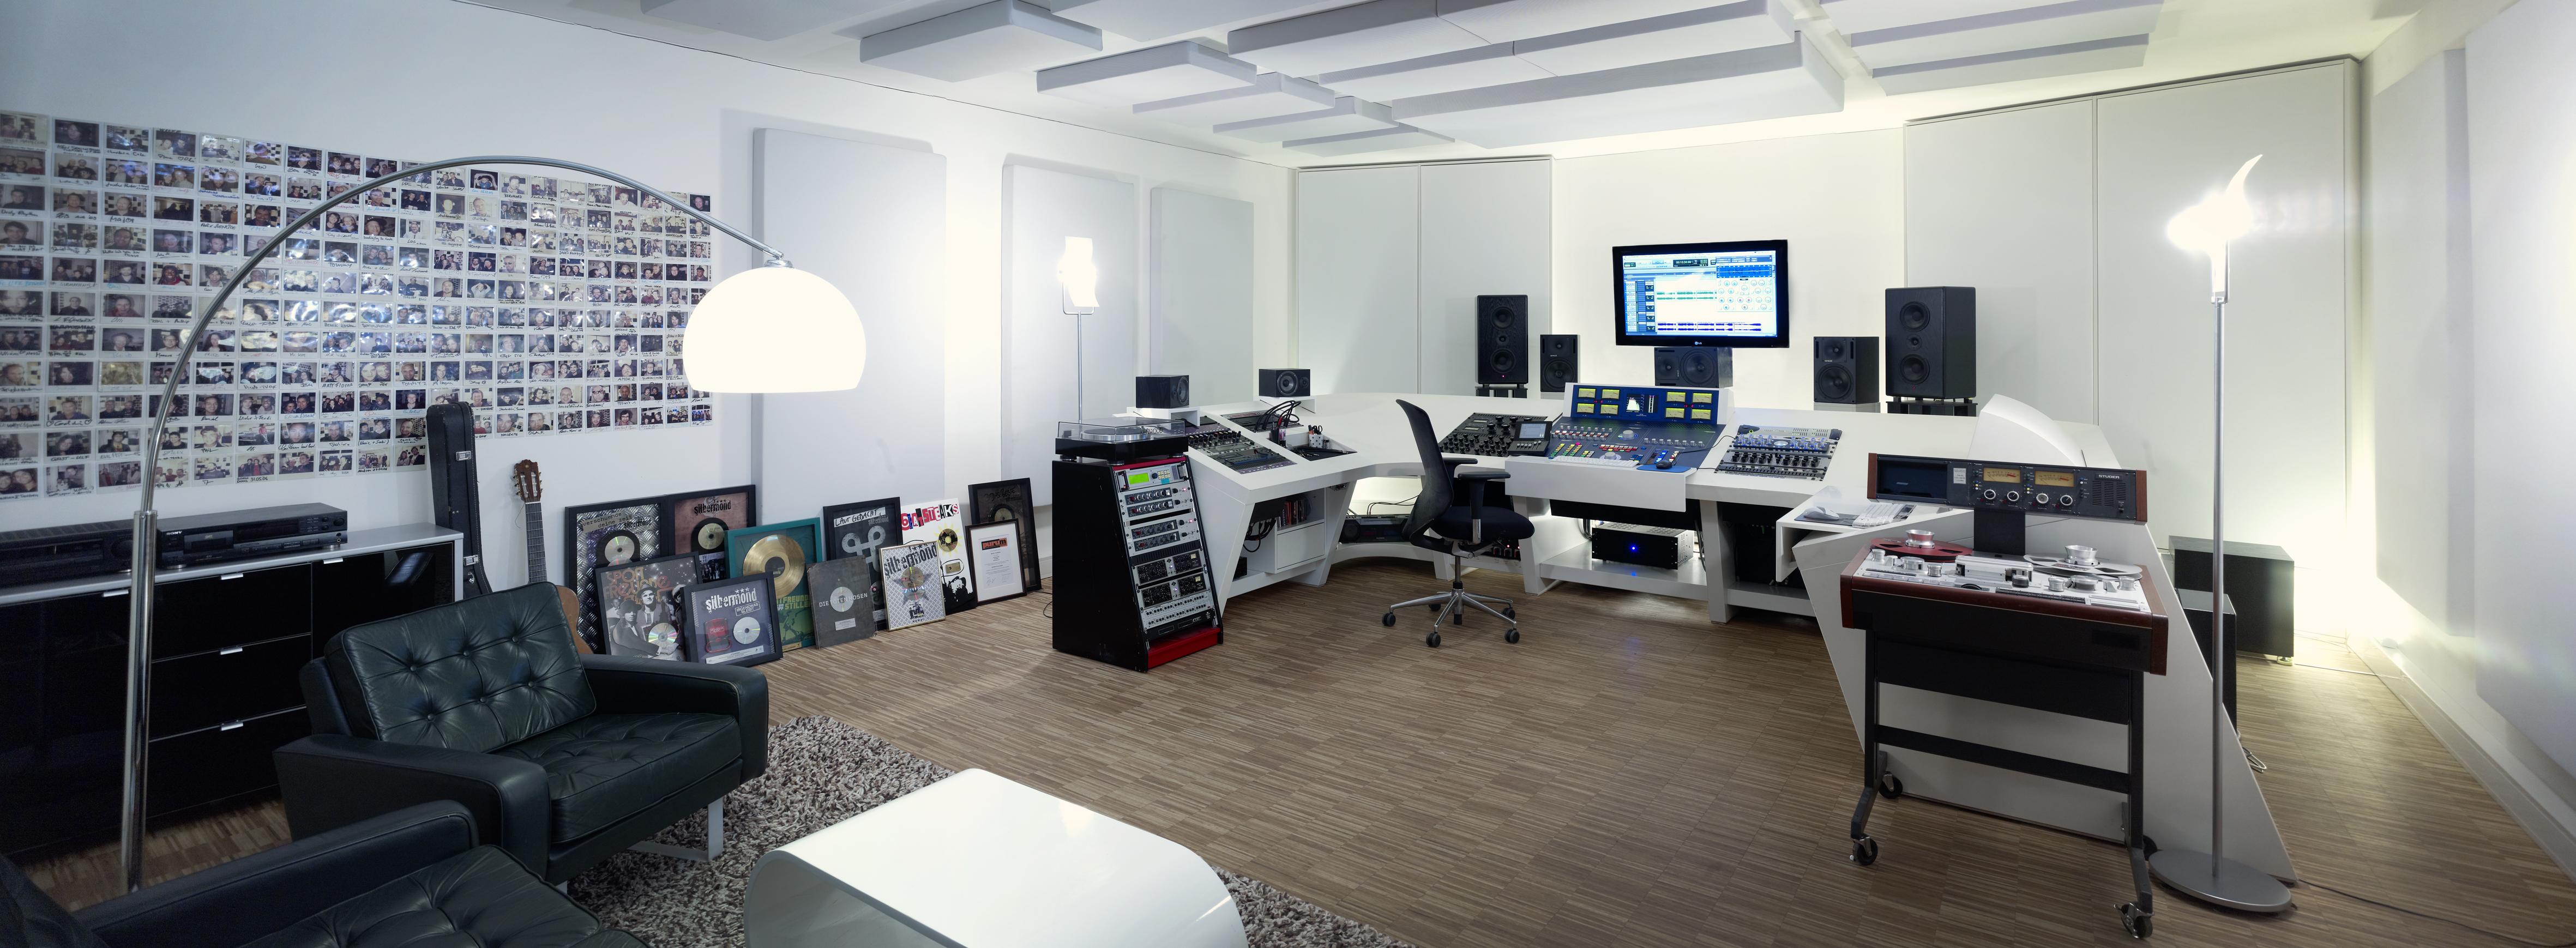 Mastering_studio_ohne_blech